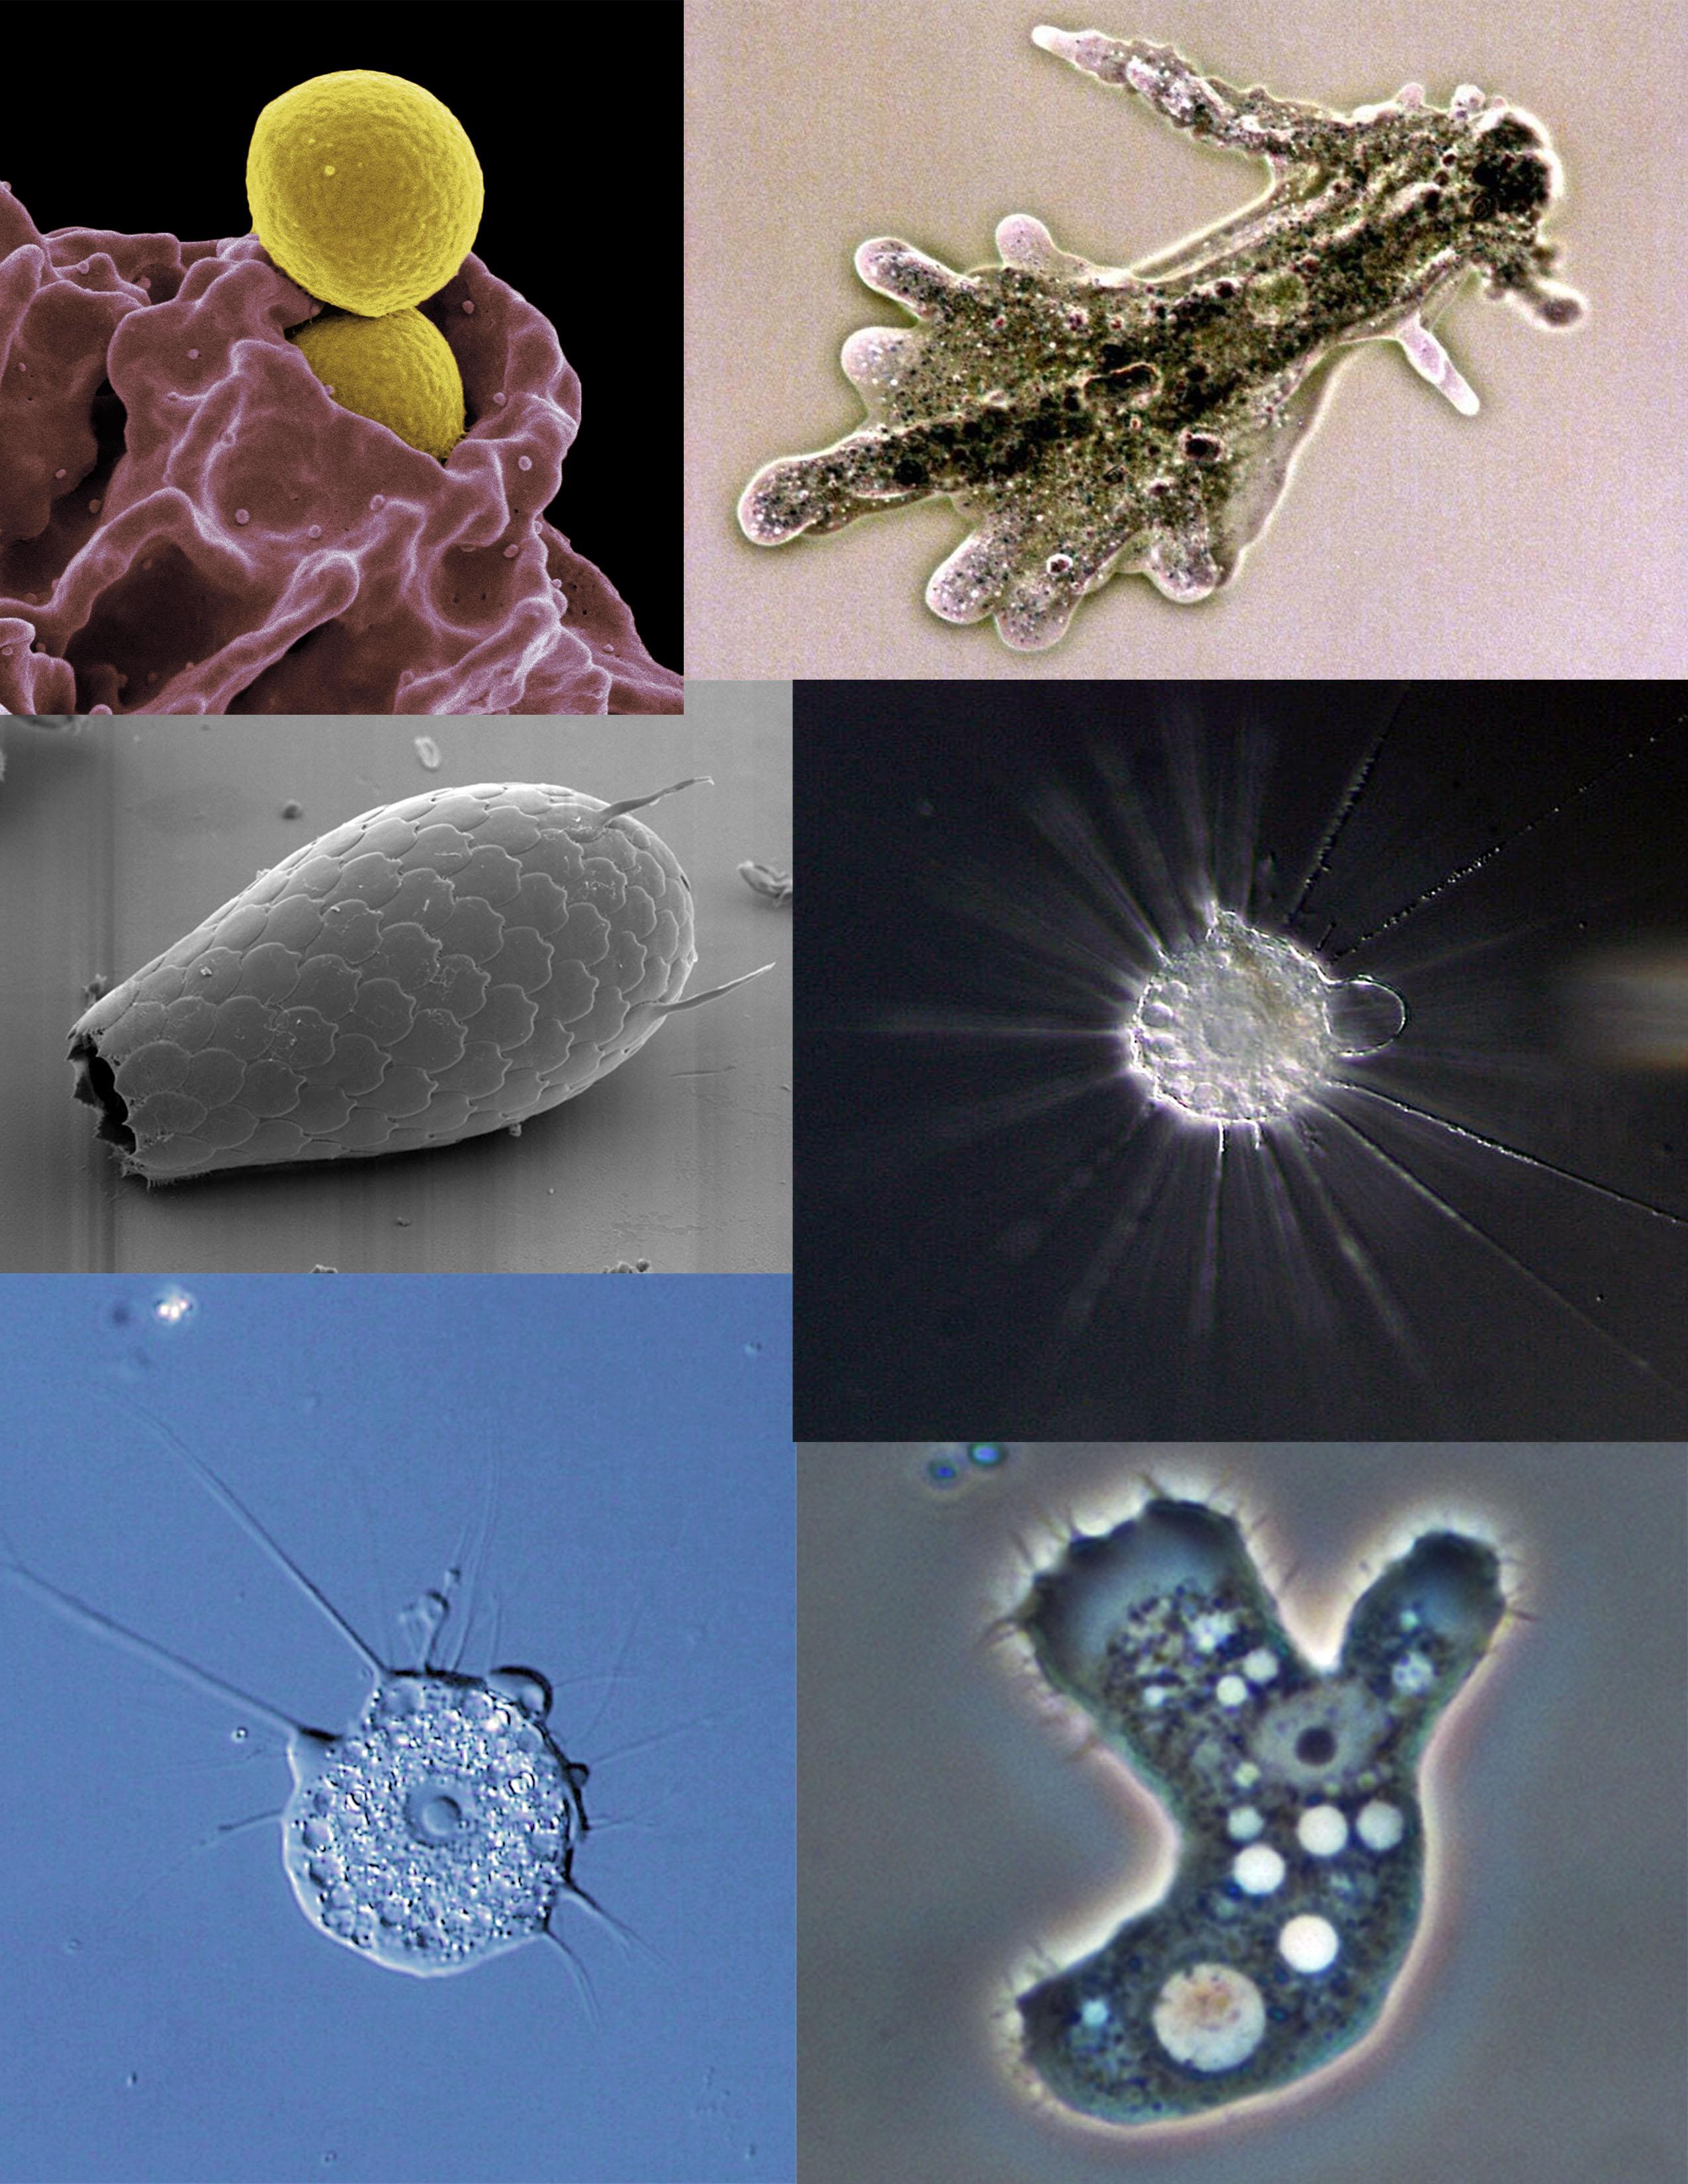 organismele parazite produc)